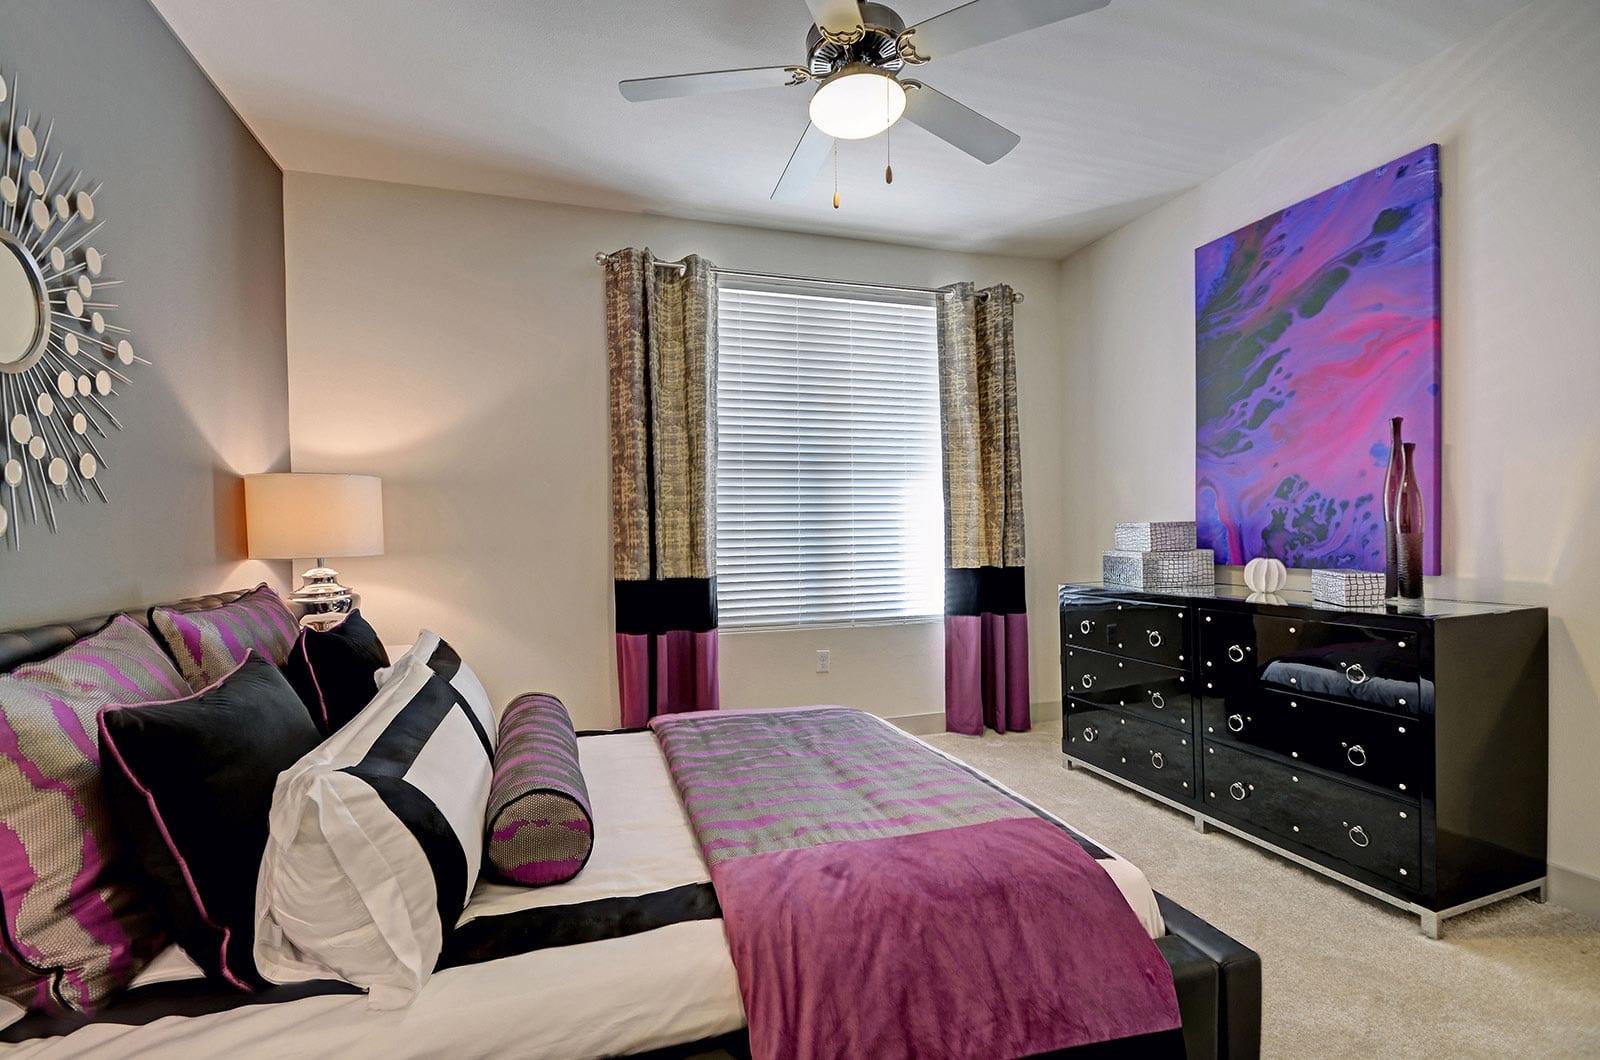 Real Estate Virtual Tour | Real Estate Virtual Tours | Virtual Tours For Real Estate